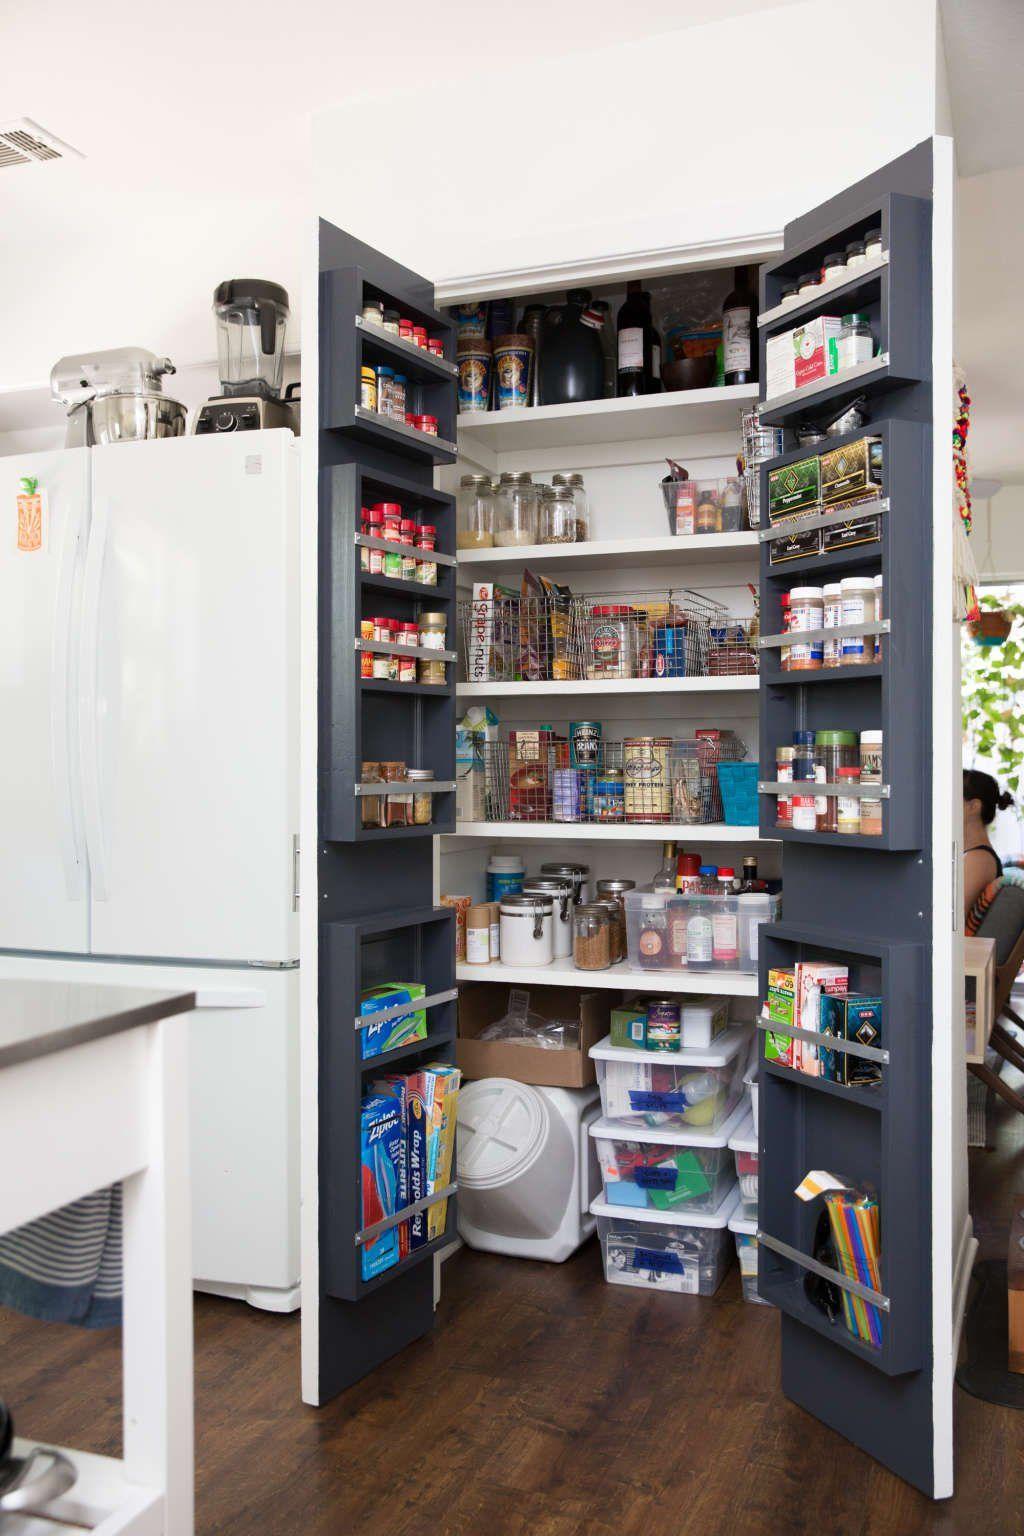 The 10 Best Pantry Hacks On Pinterest For Organizing Your Costco Haul Pantry Door Storage Diy Storage Shelves Pantry Storage